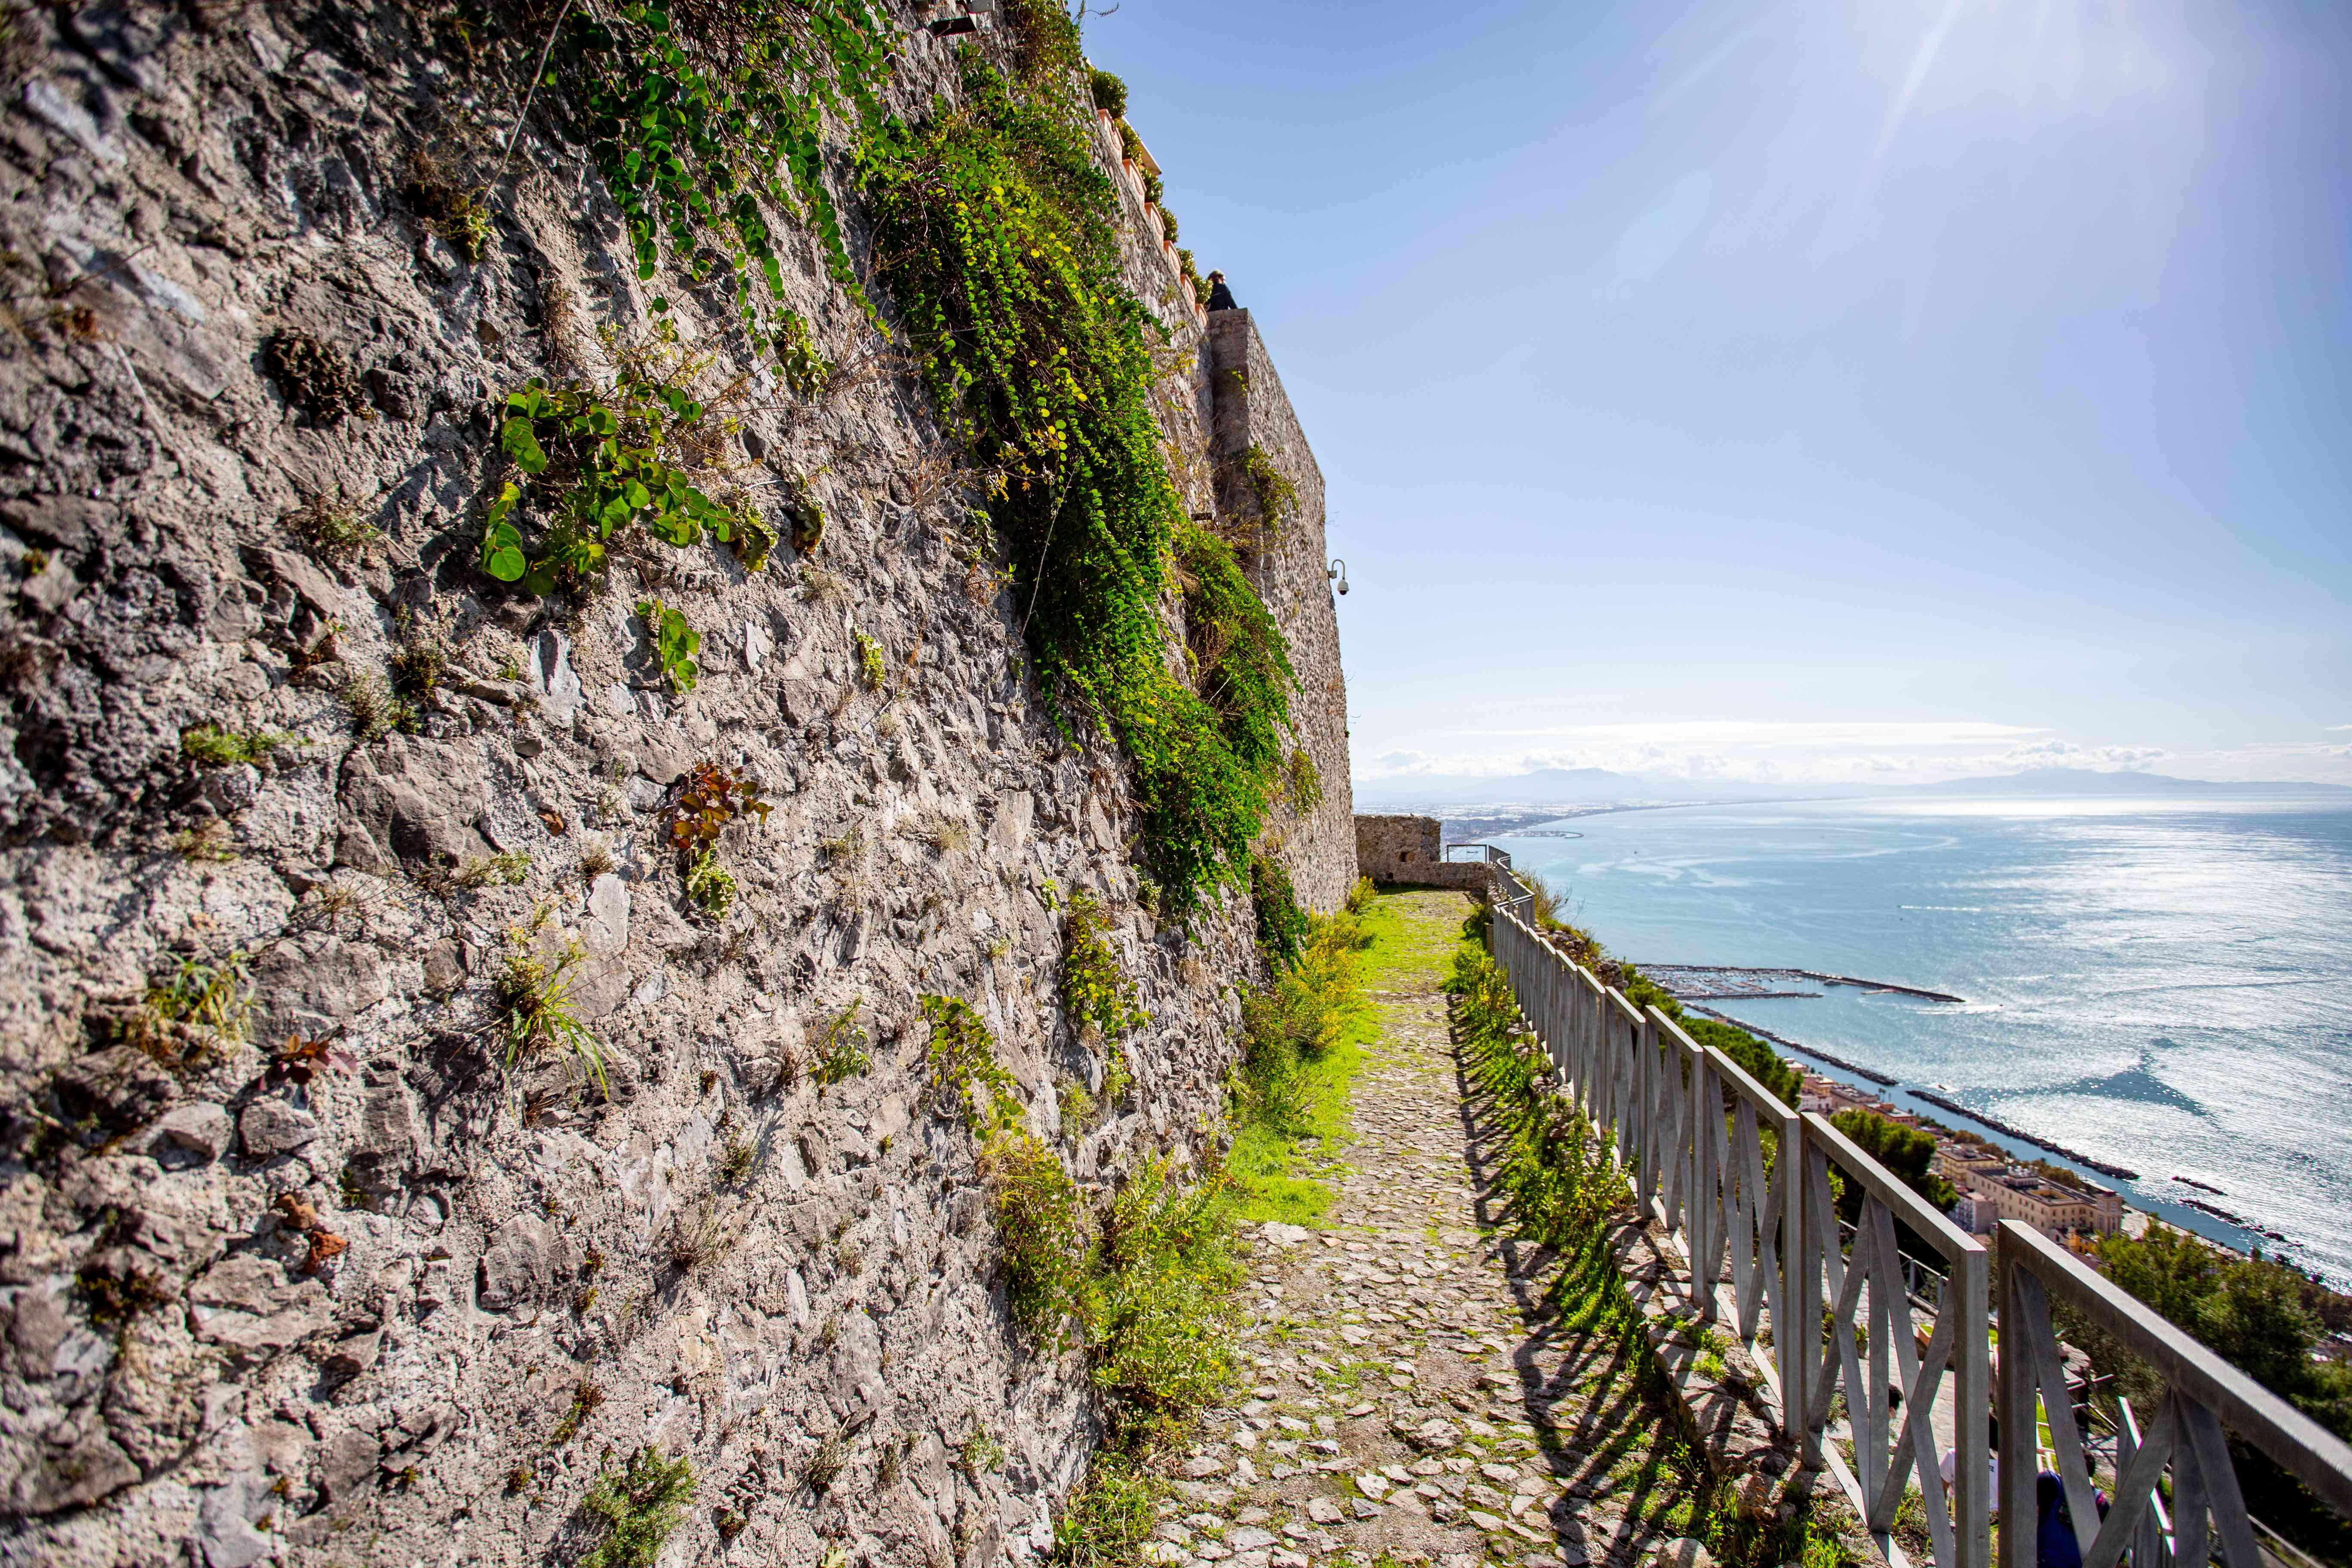 Arechi Castle in Salerno, Italy